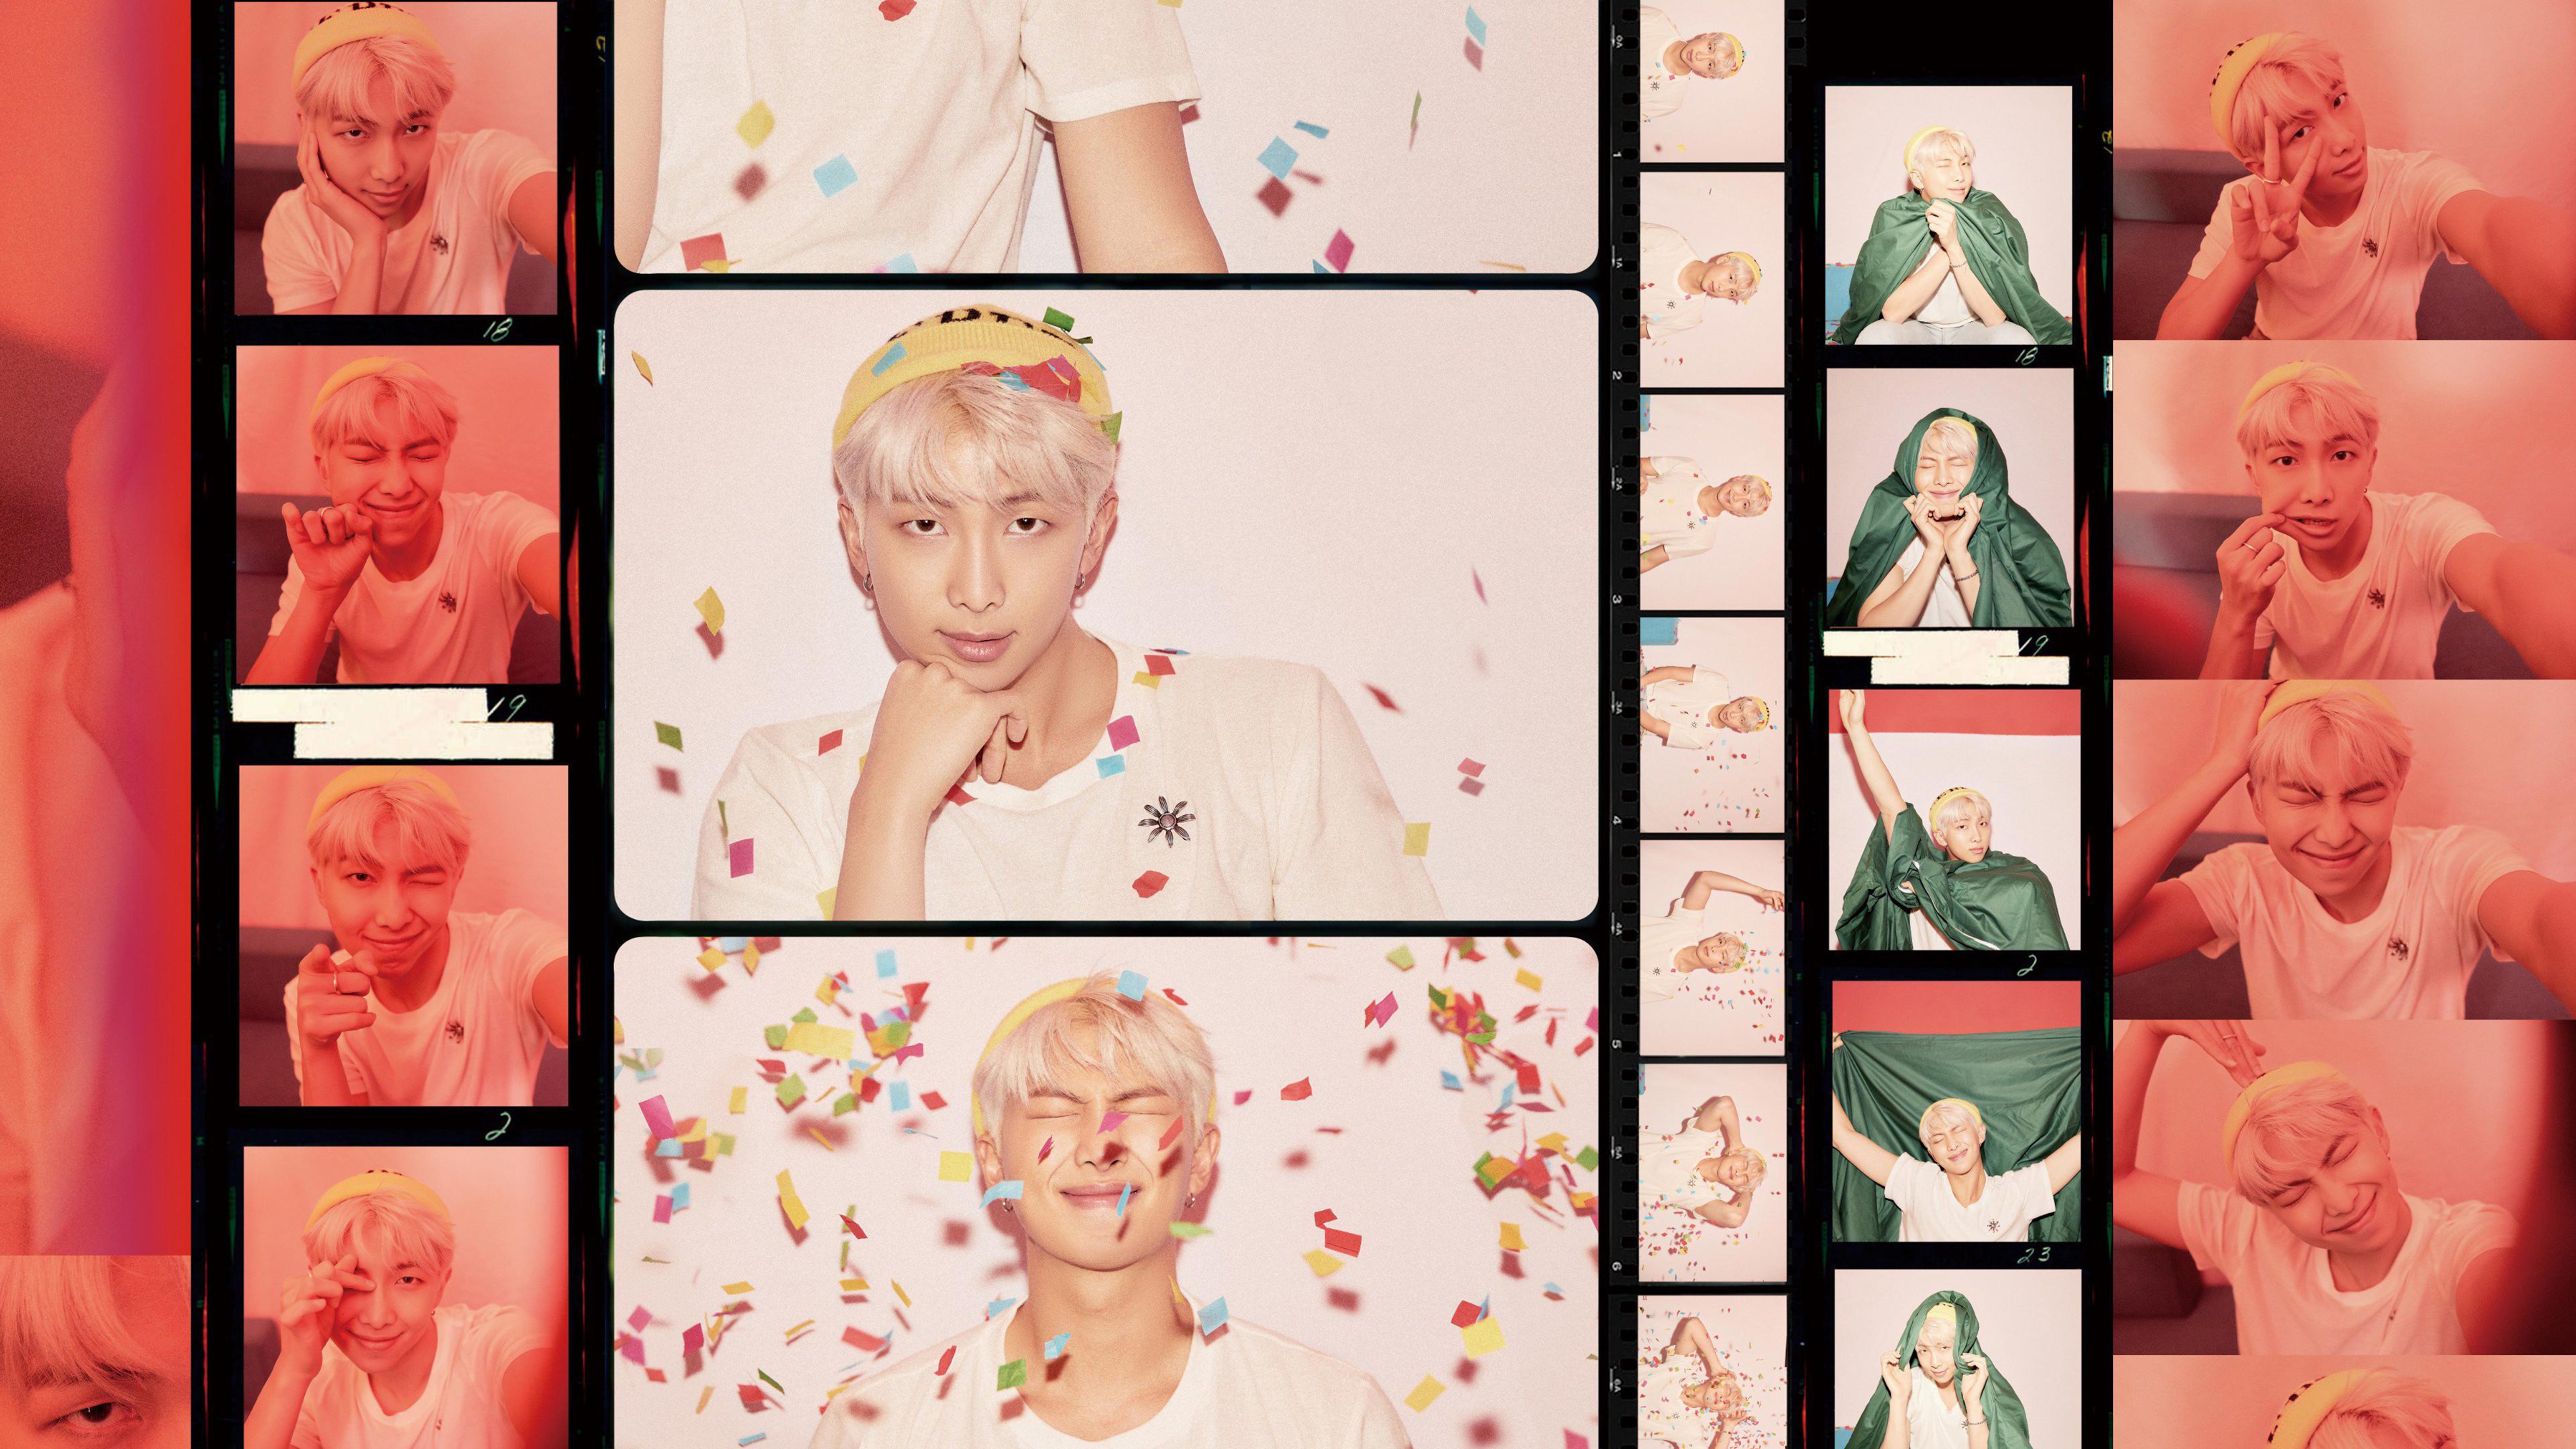 Ipad Wallpaper Aesthetic Collage